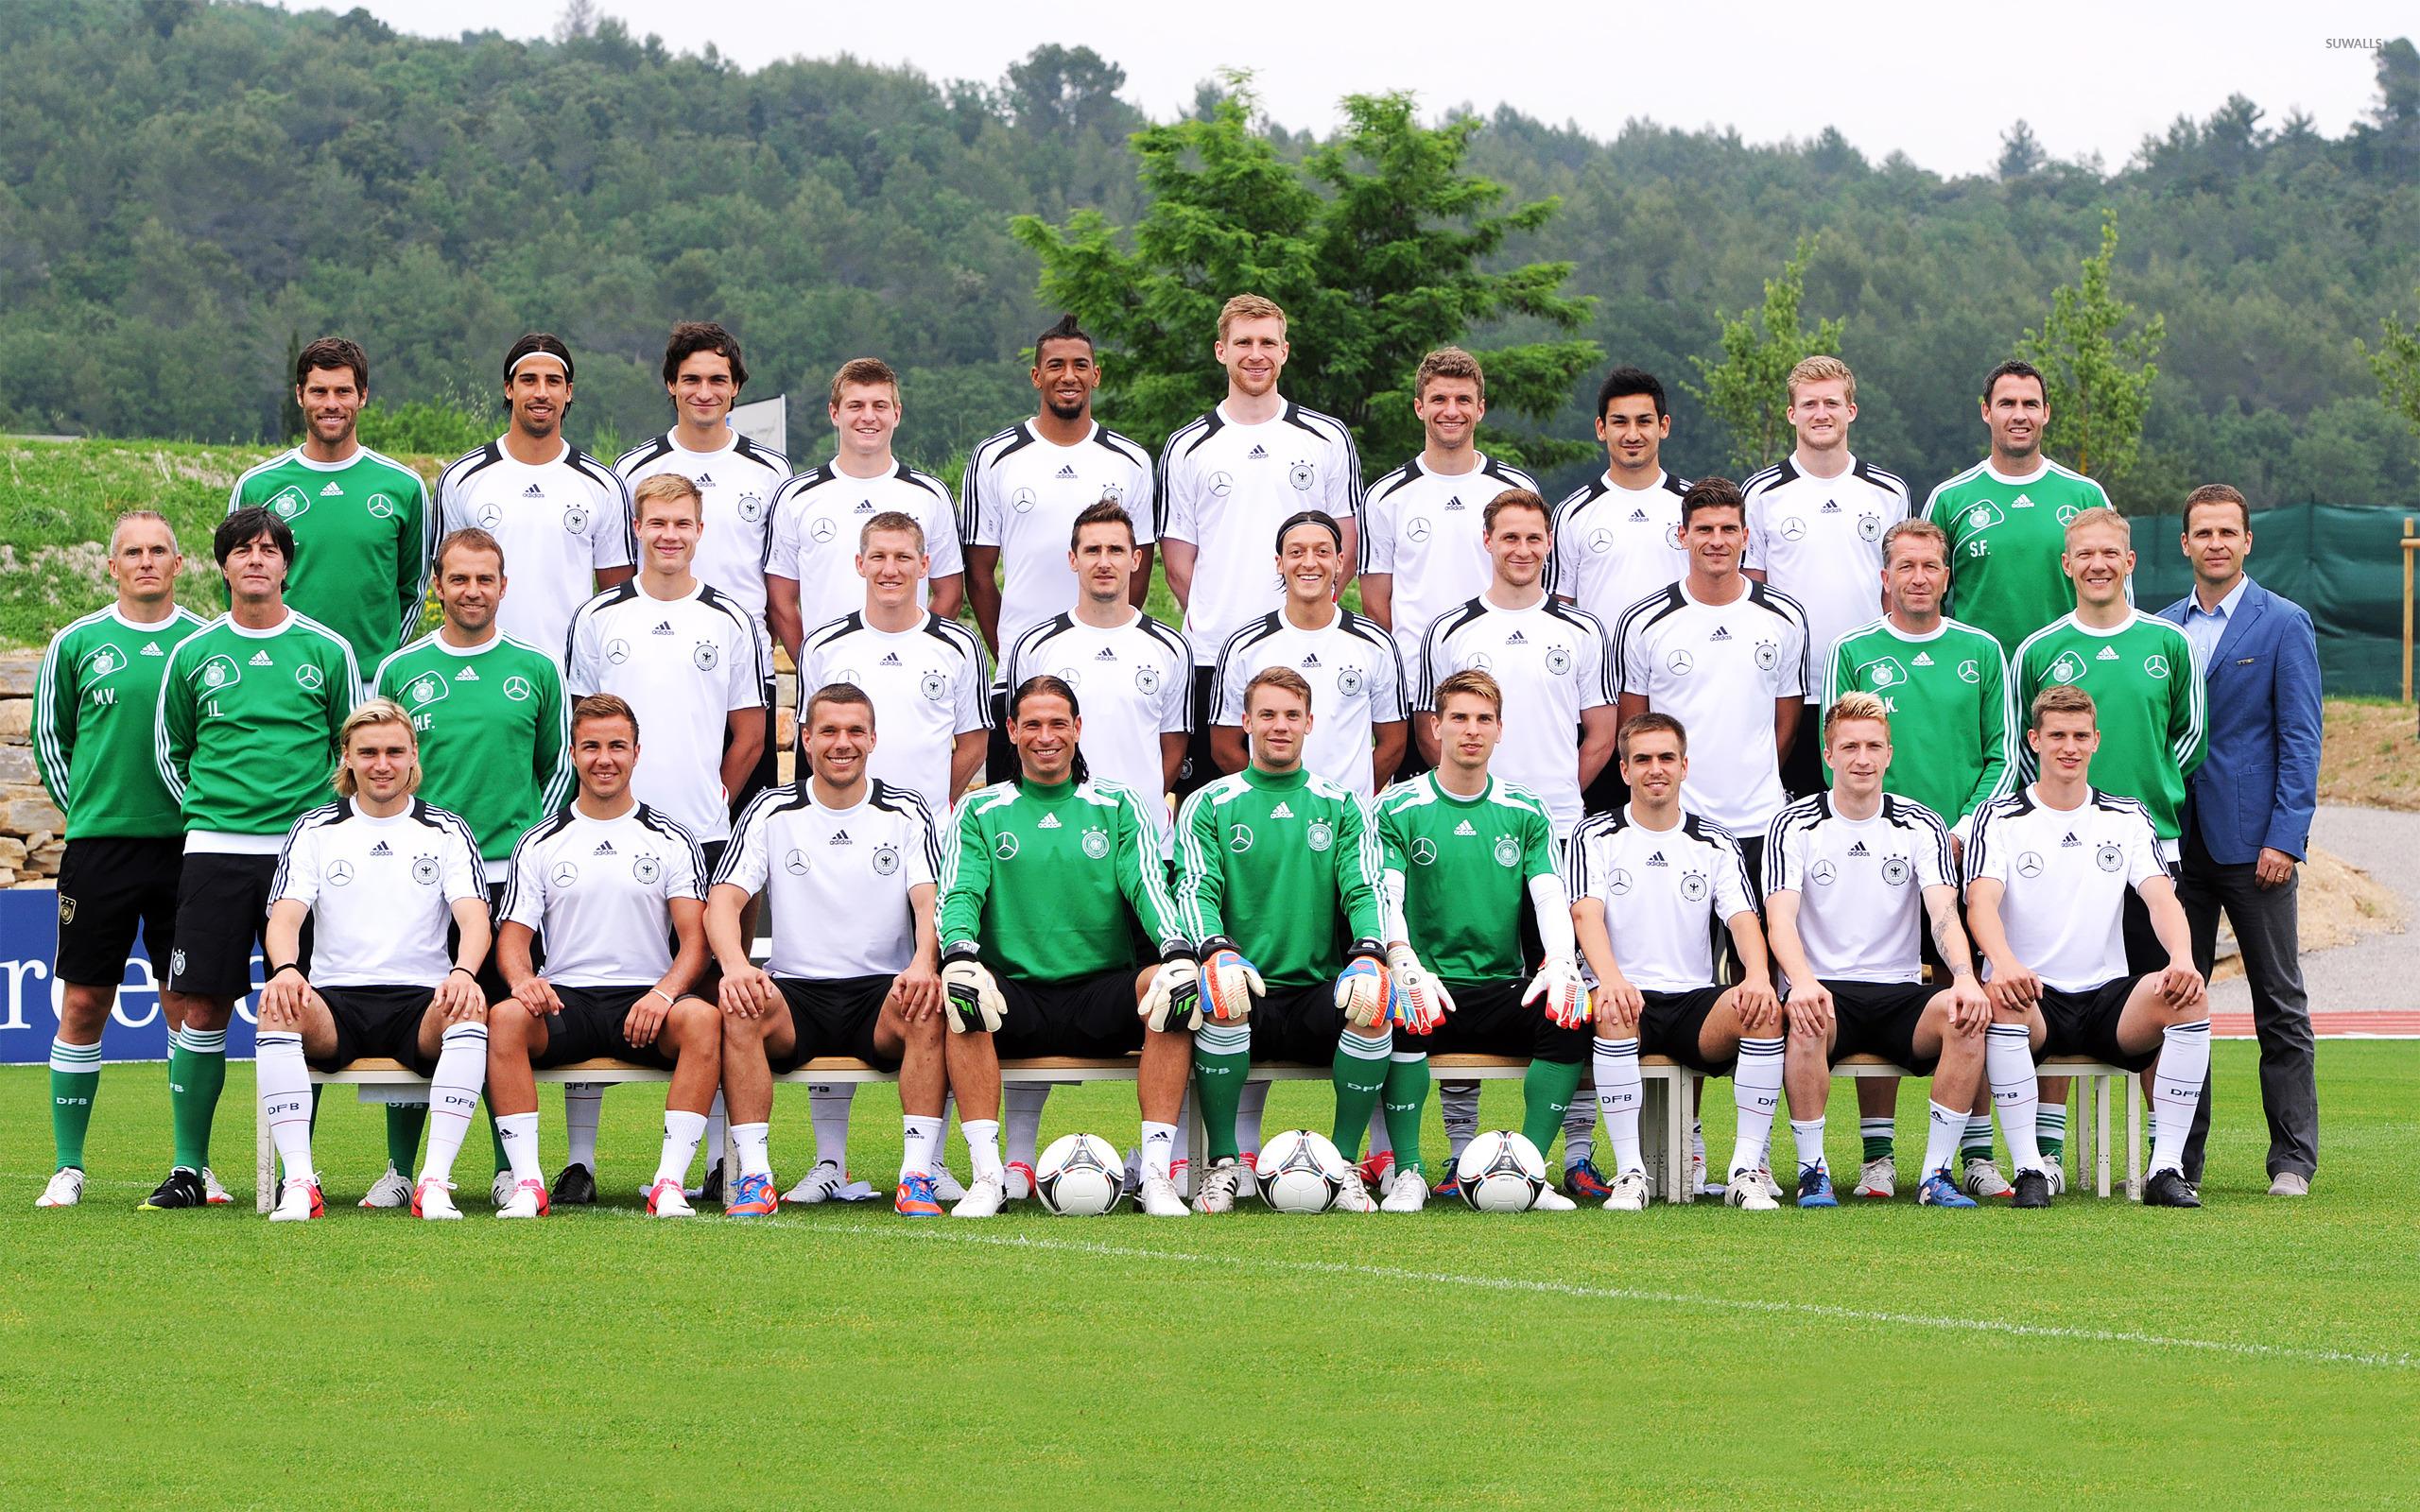 Germany national football team 2012 wallpaper   Sport wallpapers 2560x1600